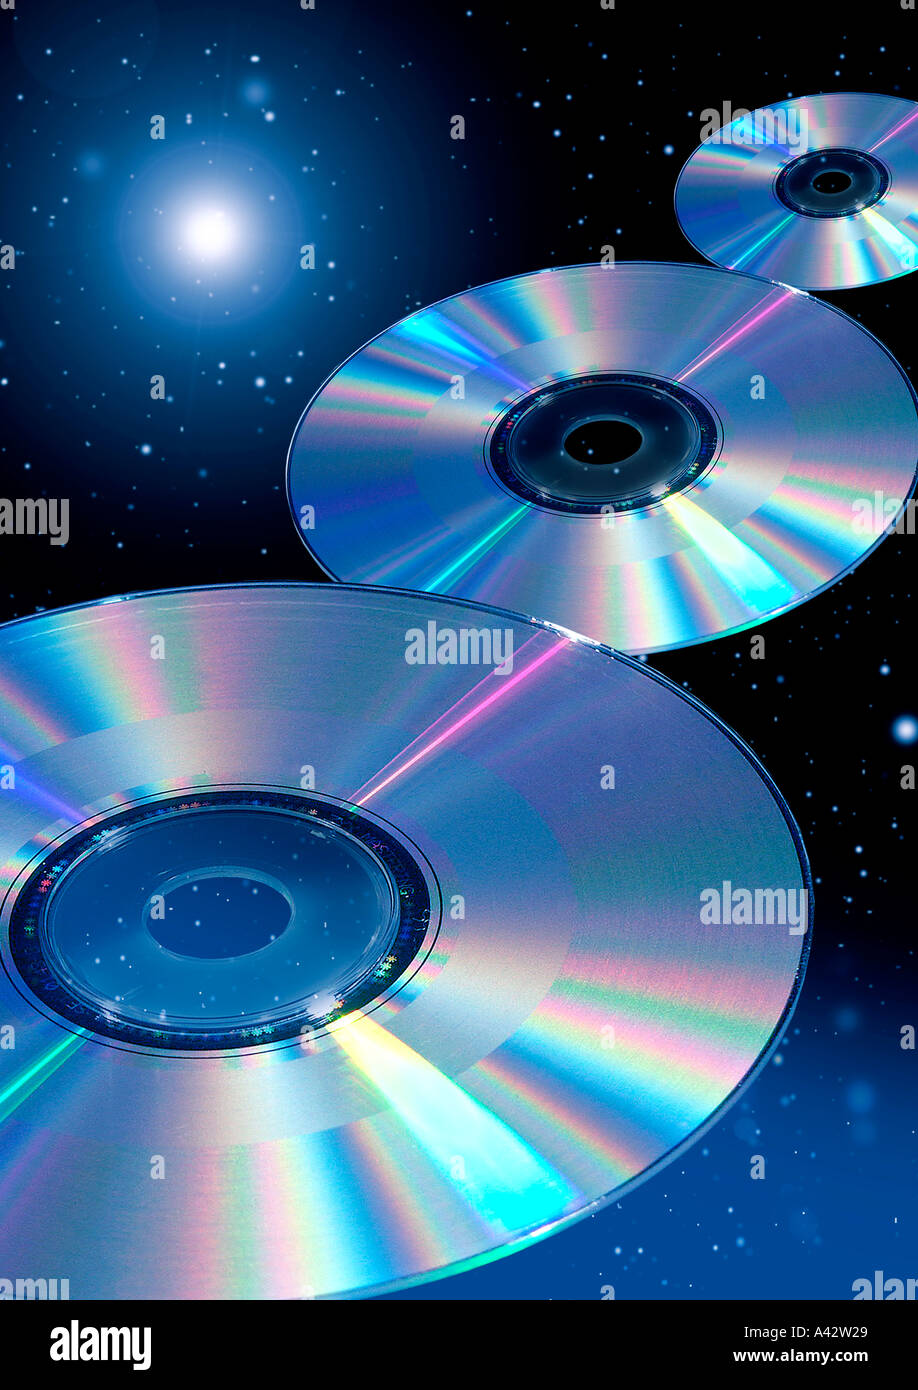 DVD CD - Stock Image